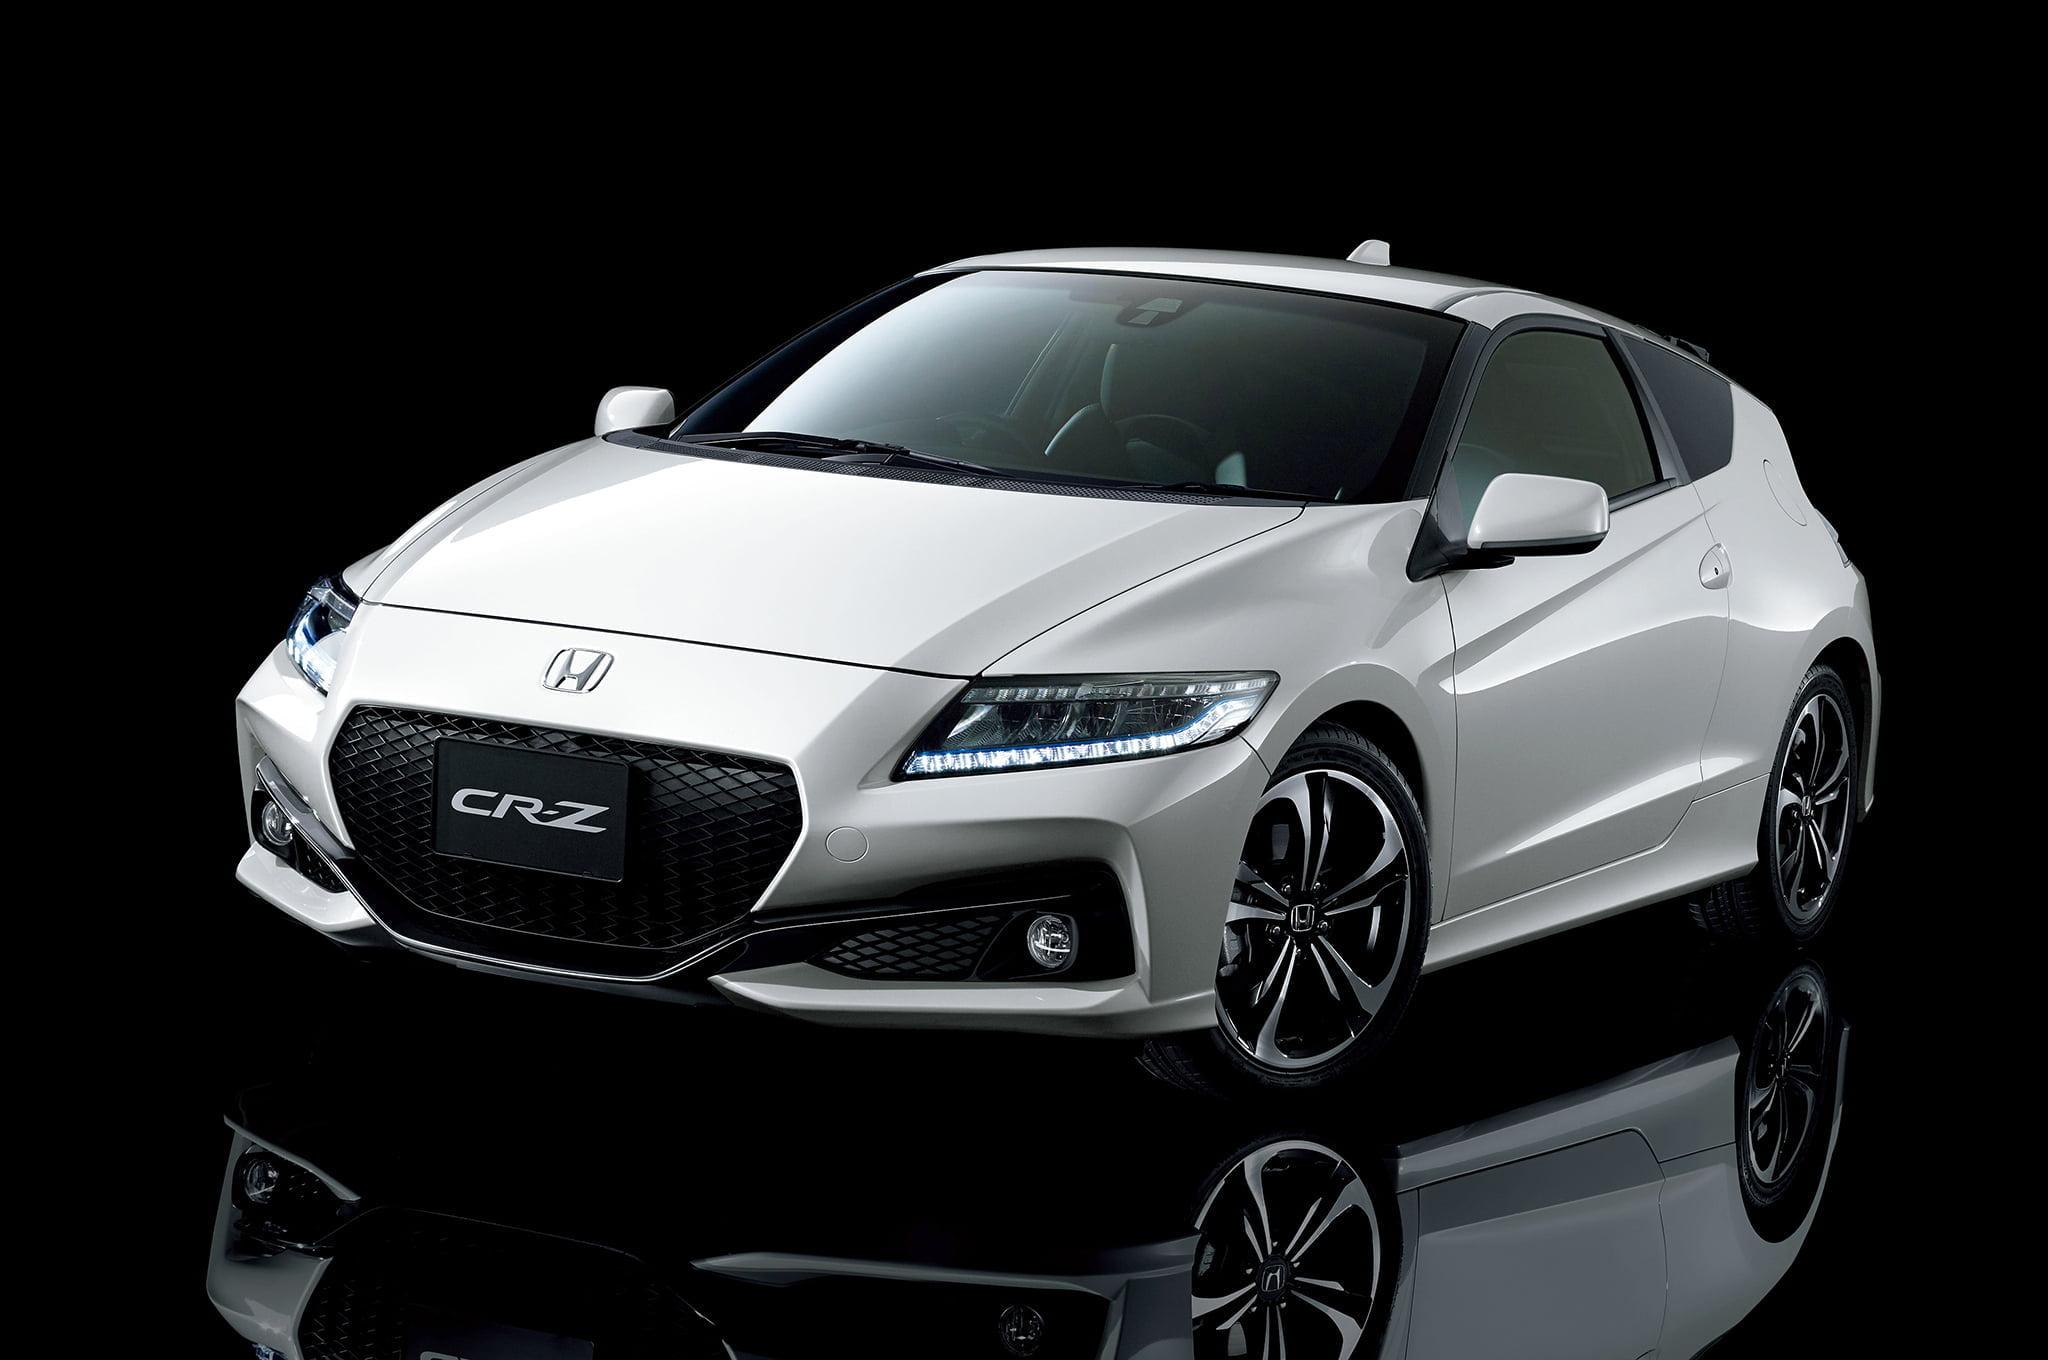 Honda CRZ - 从喜欢Hybrid 到不喜欢Hybrid